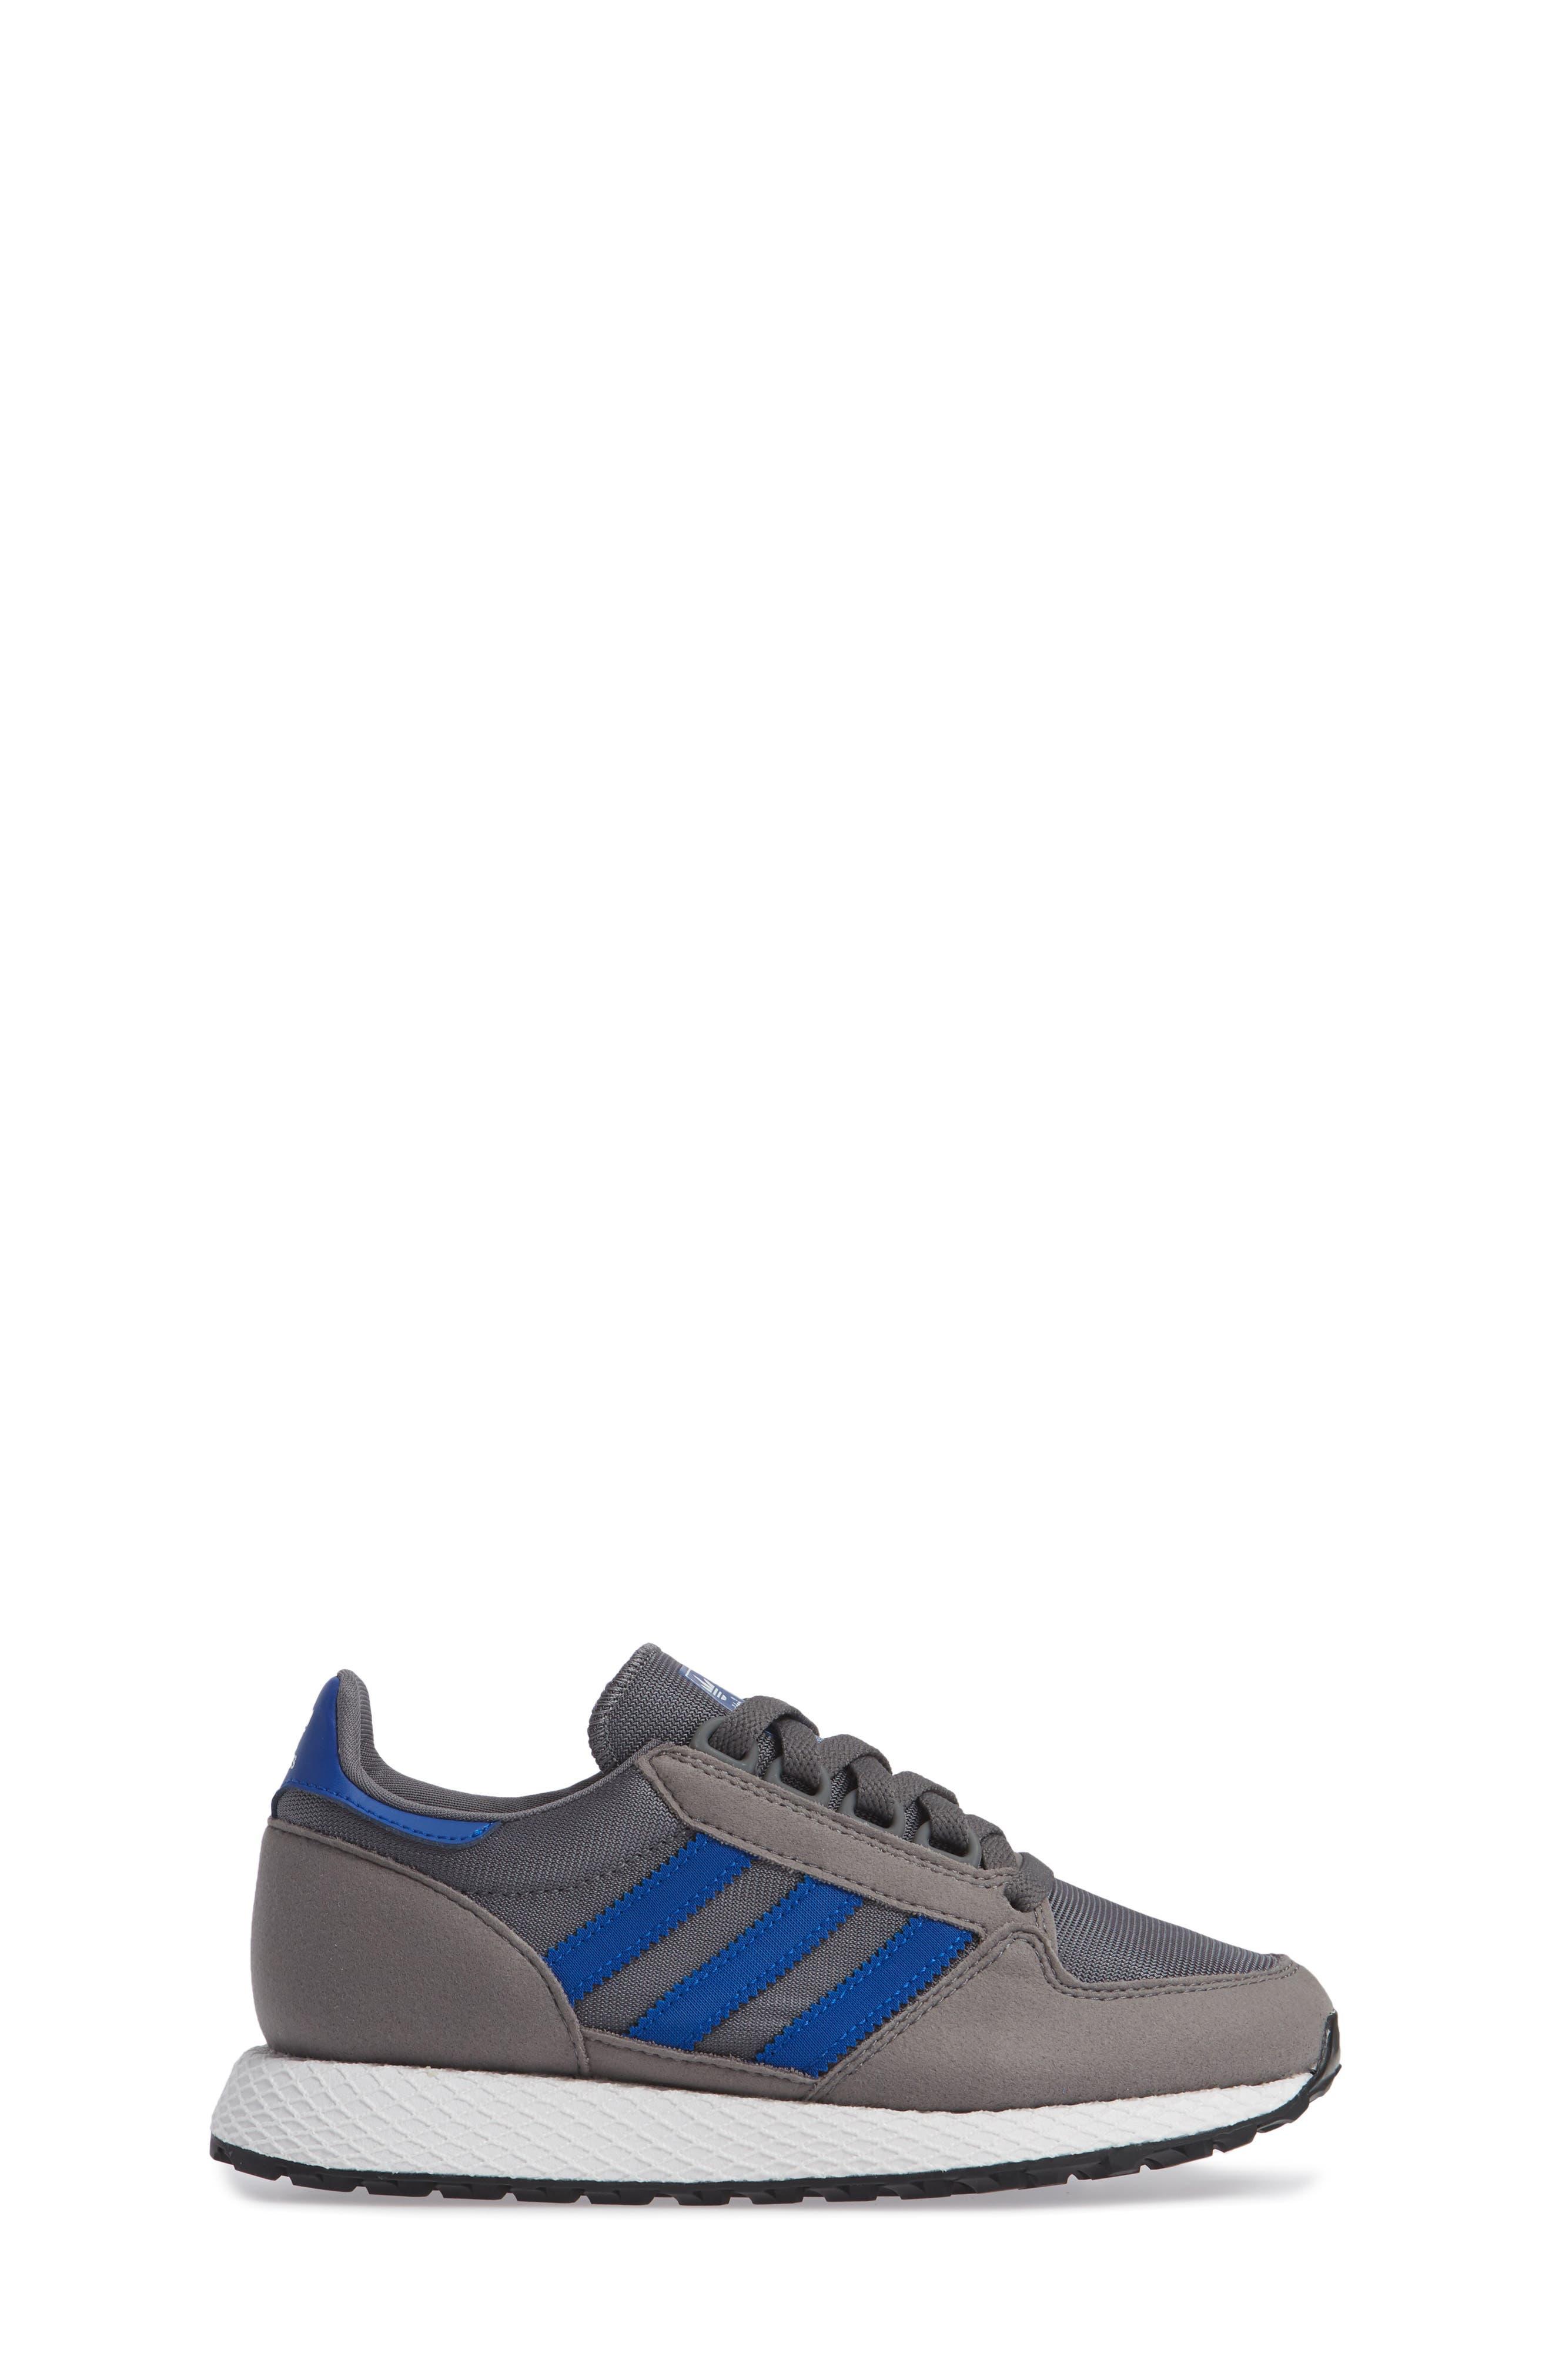 Forest Grove Sneaker,                             Alternate thumbnail 3, color,                             GREY/ COLLEGIATE ROYAL/ WHITE